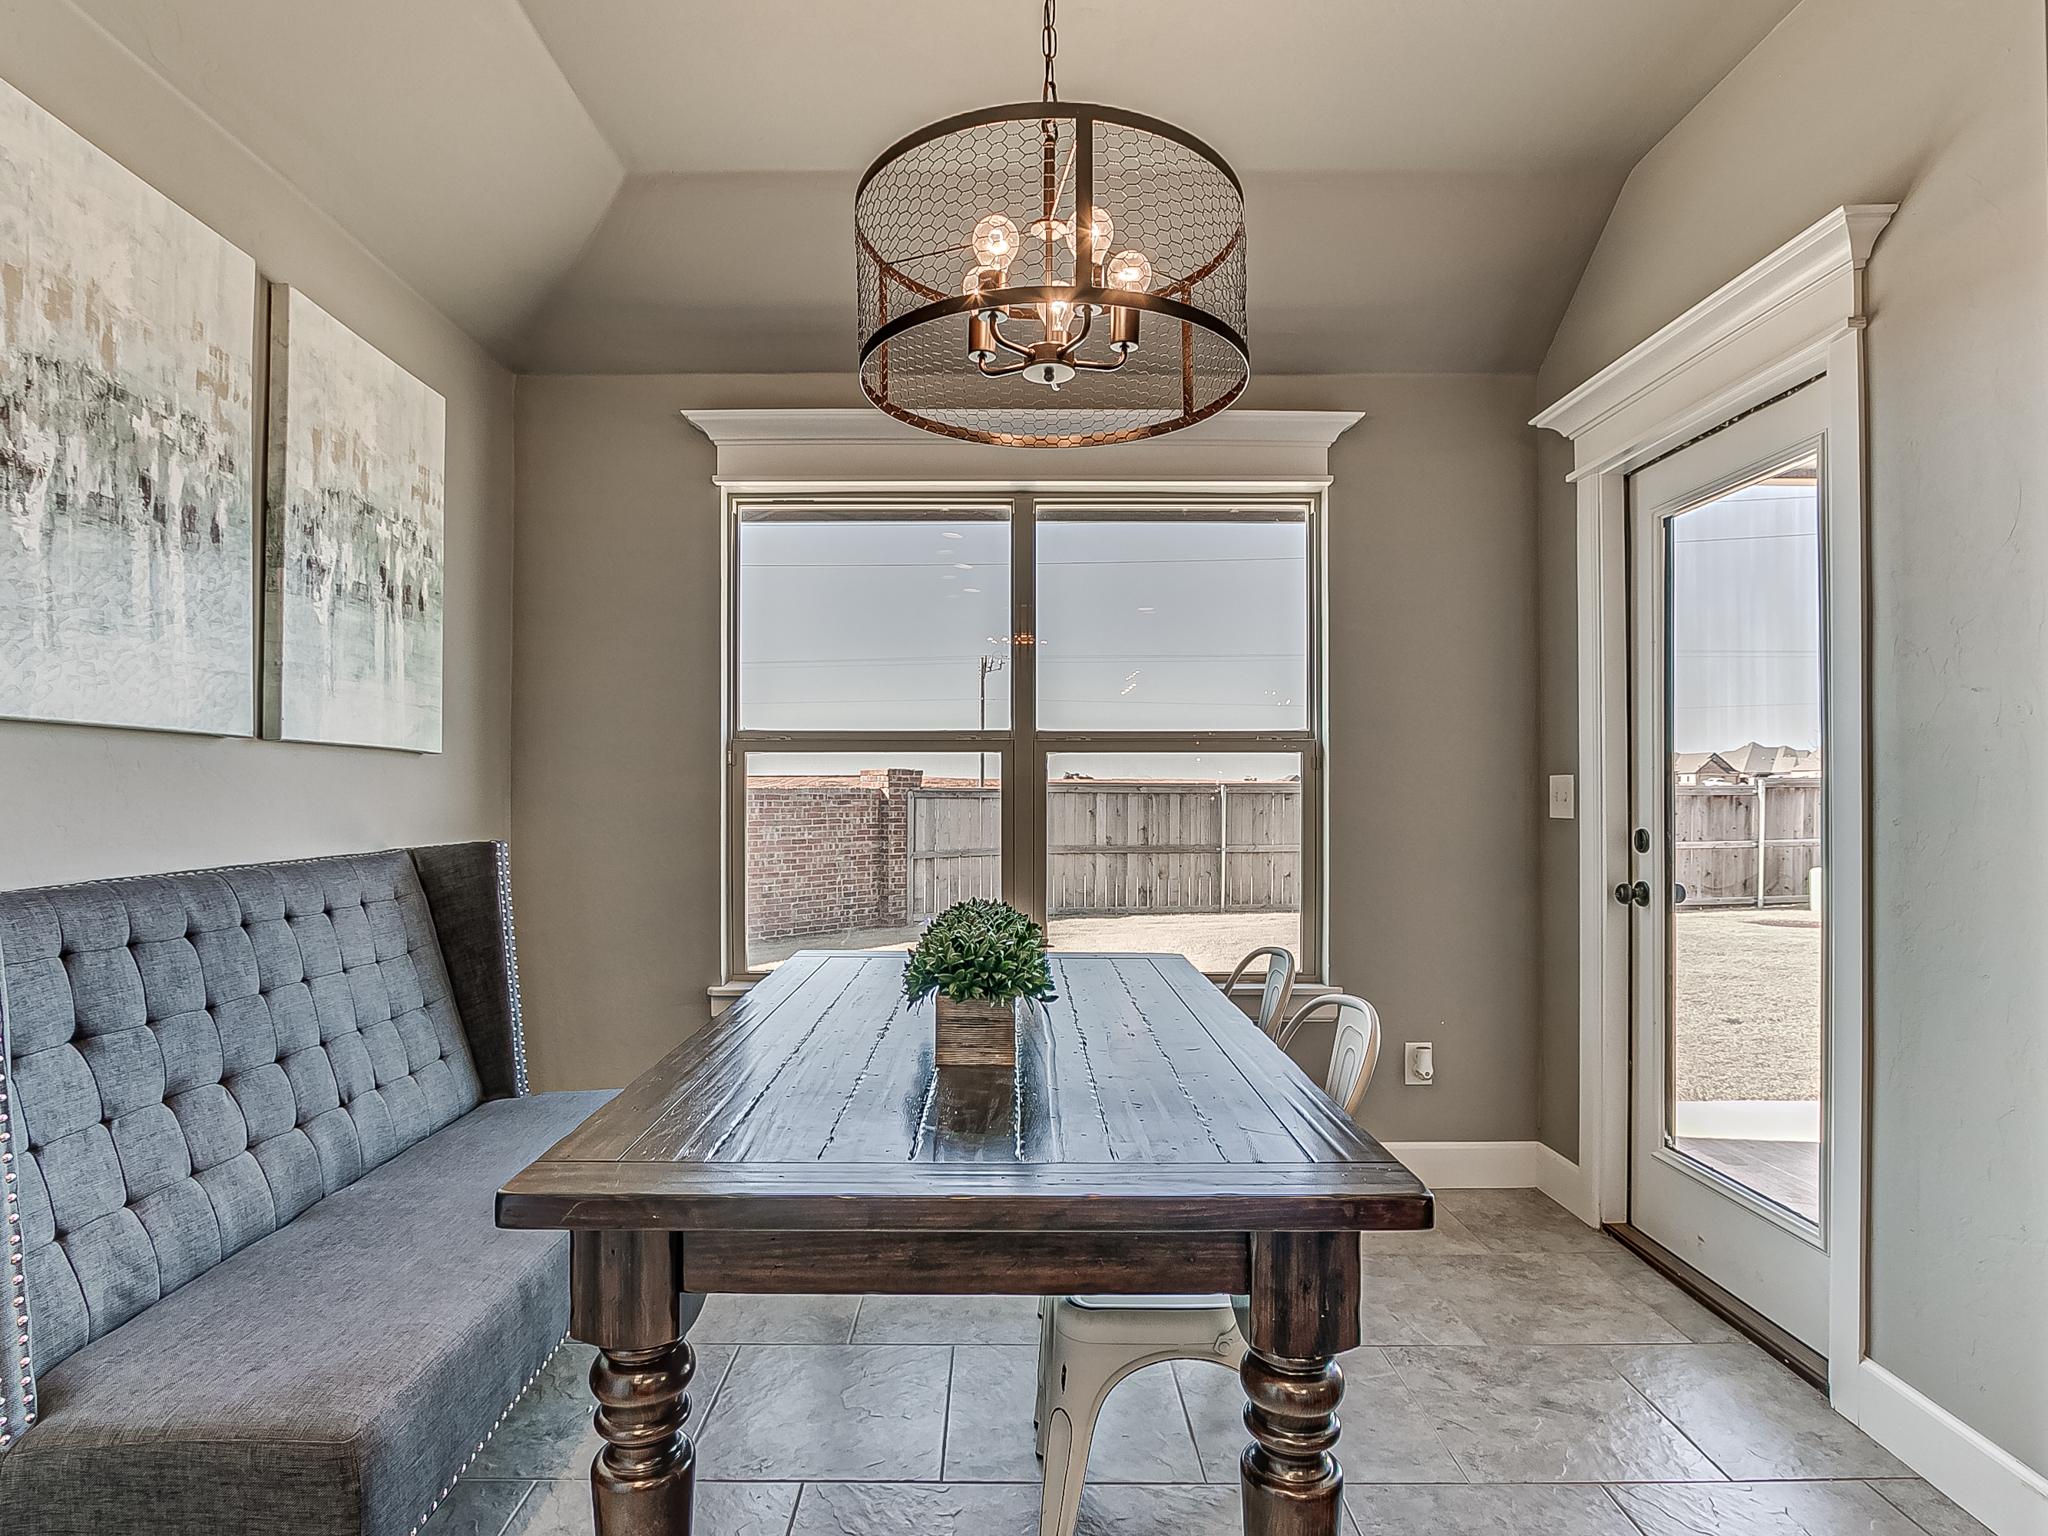 4213 Brougham Way, Oklahoma City, Oklahoma 73179, 3 Bedrooms Bedrooms, ,2 BathroomsBathrooms,House,For Sale,Brougham Way,1116